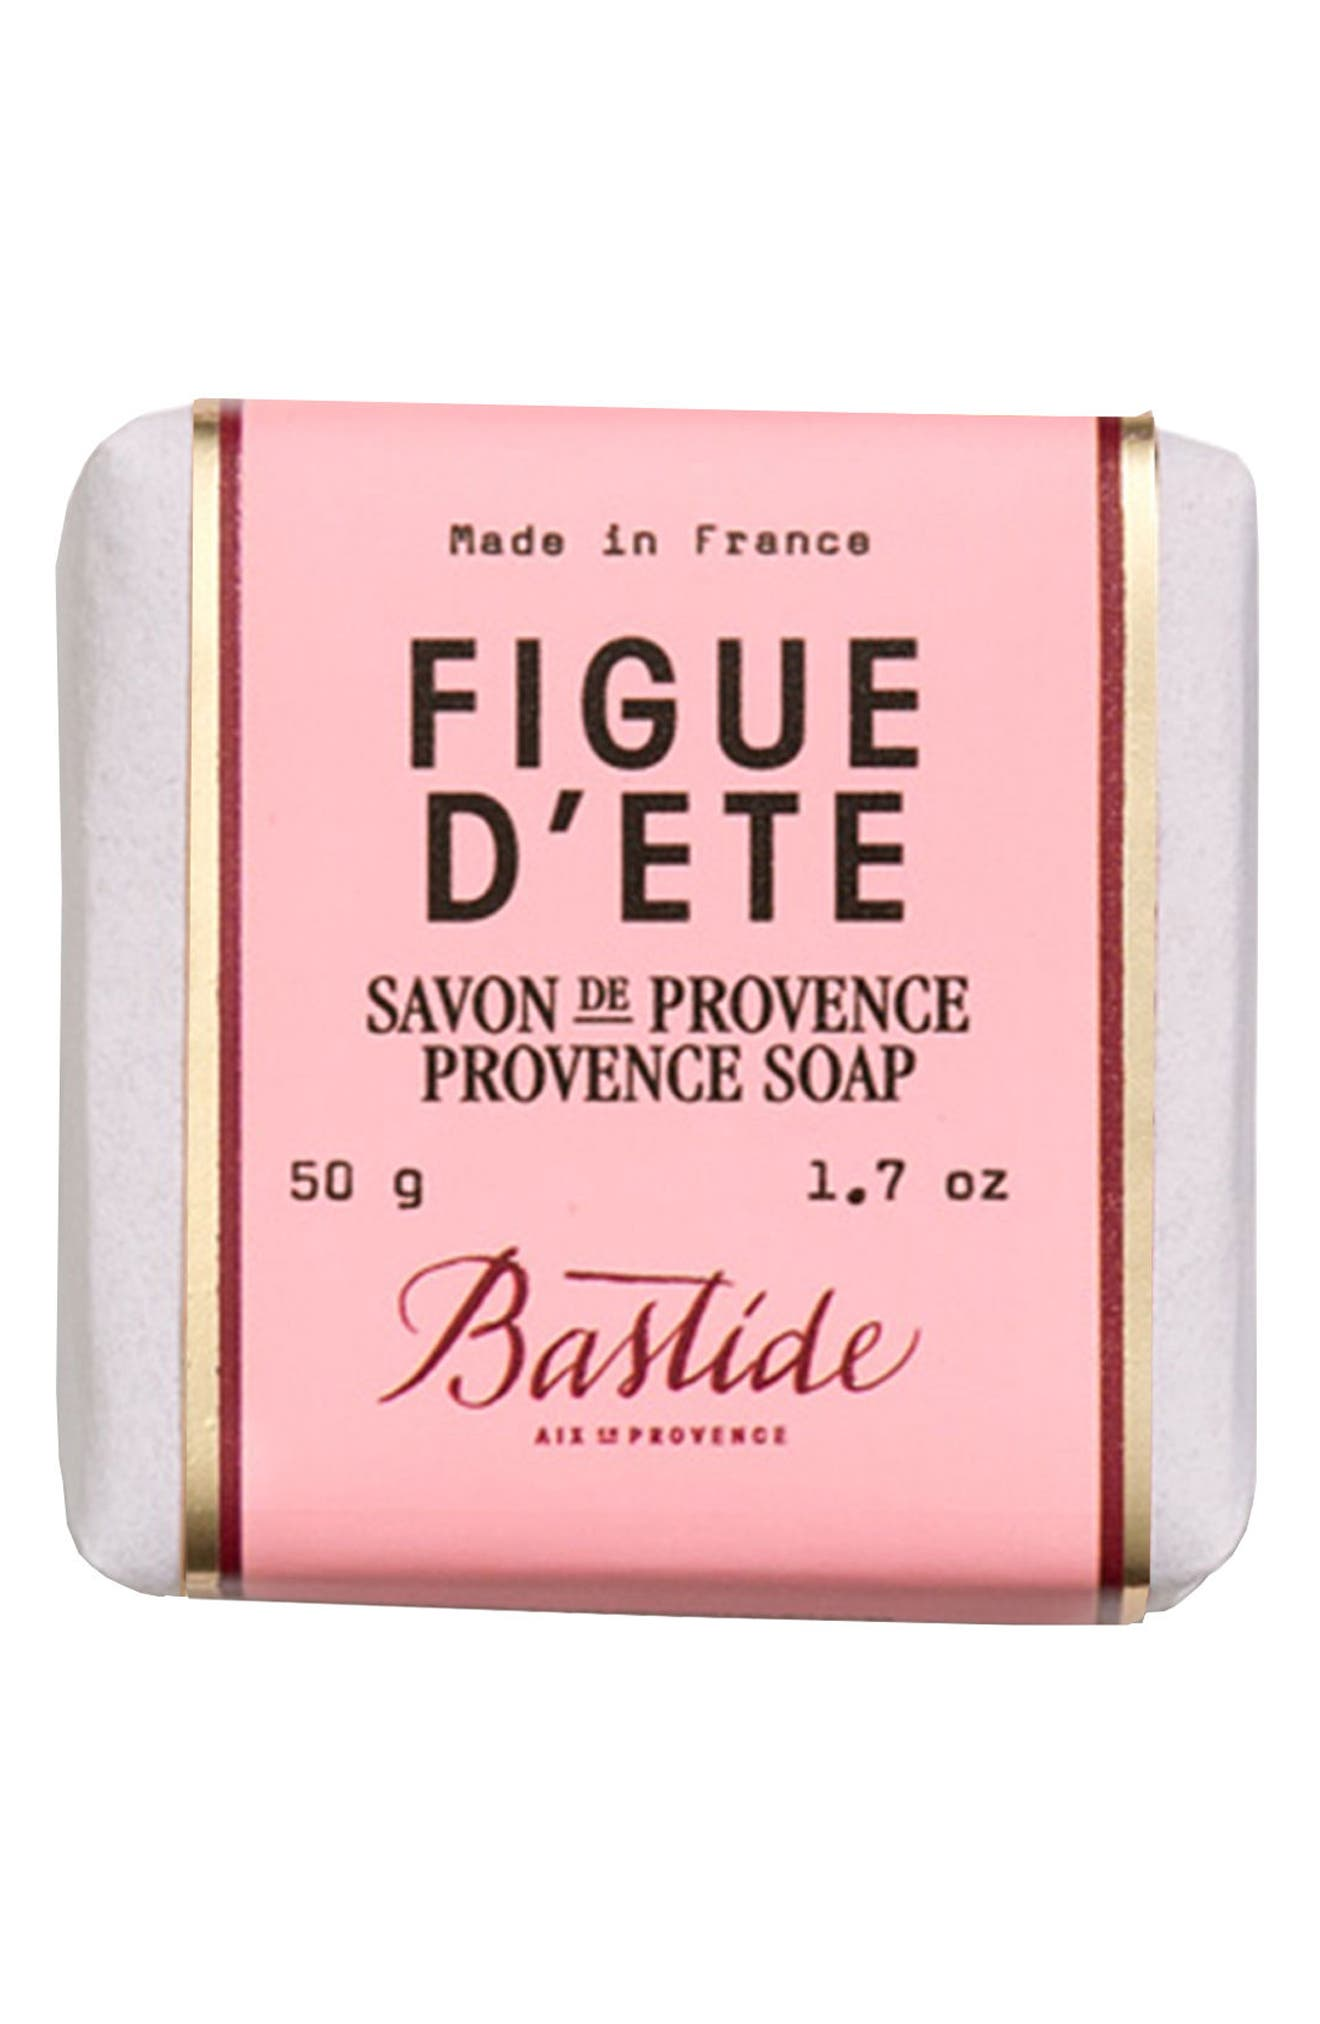 Bastide Artisanal Provence Soap